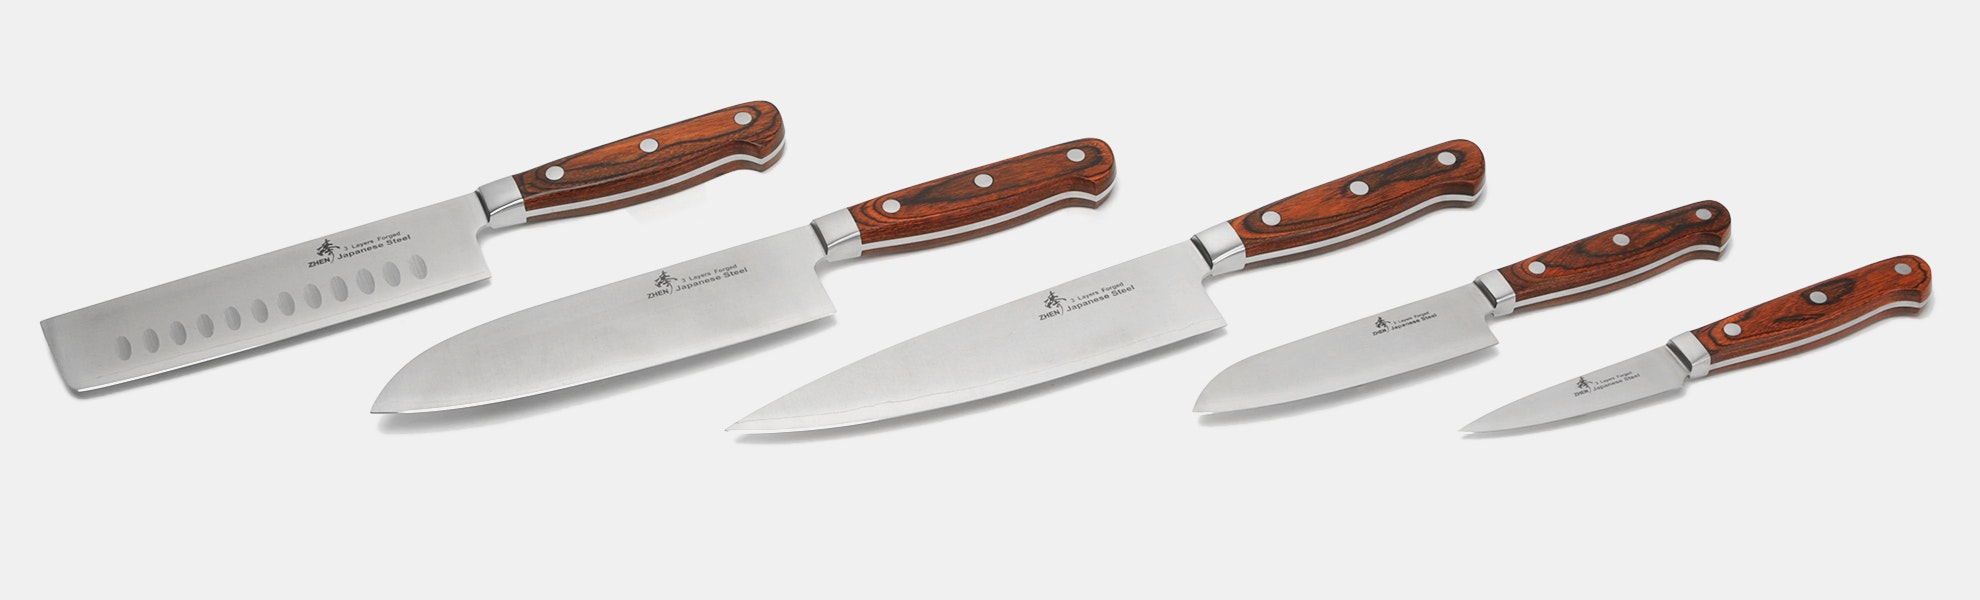 Zhen VG-10 3-Layer Forged Kitchen Knives